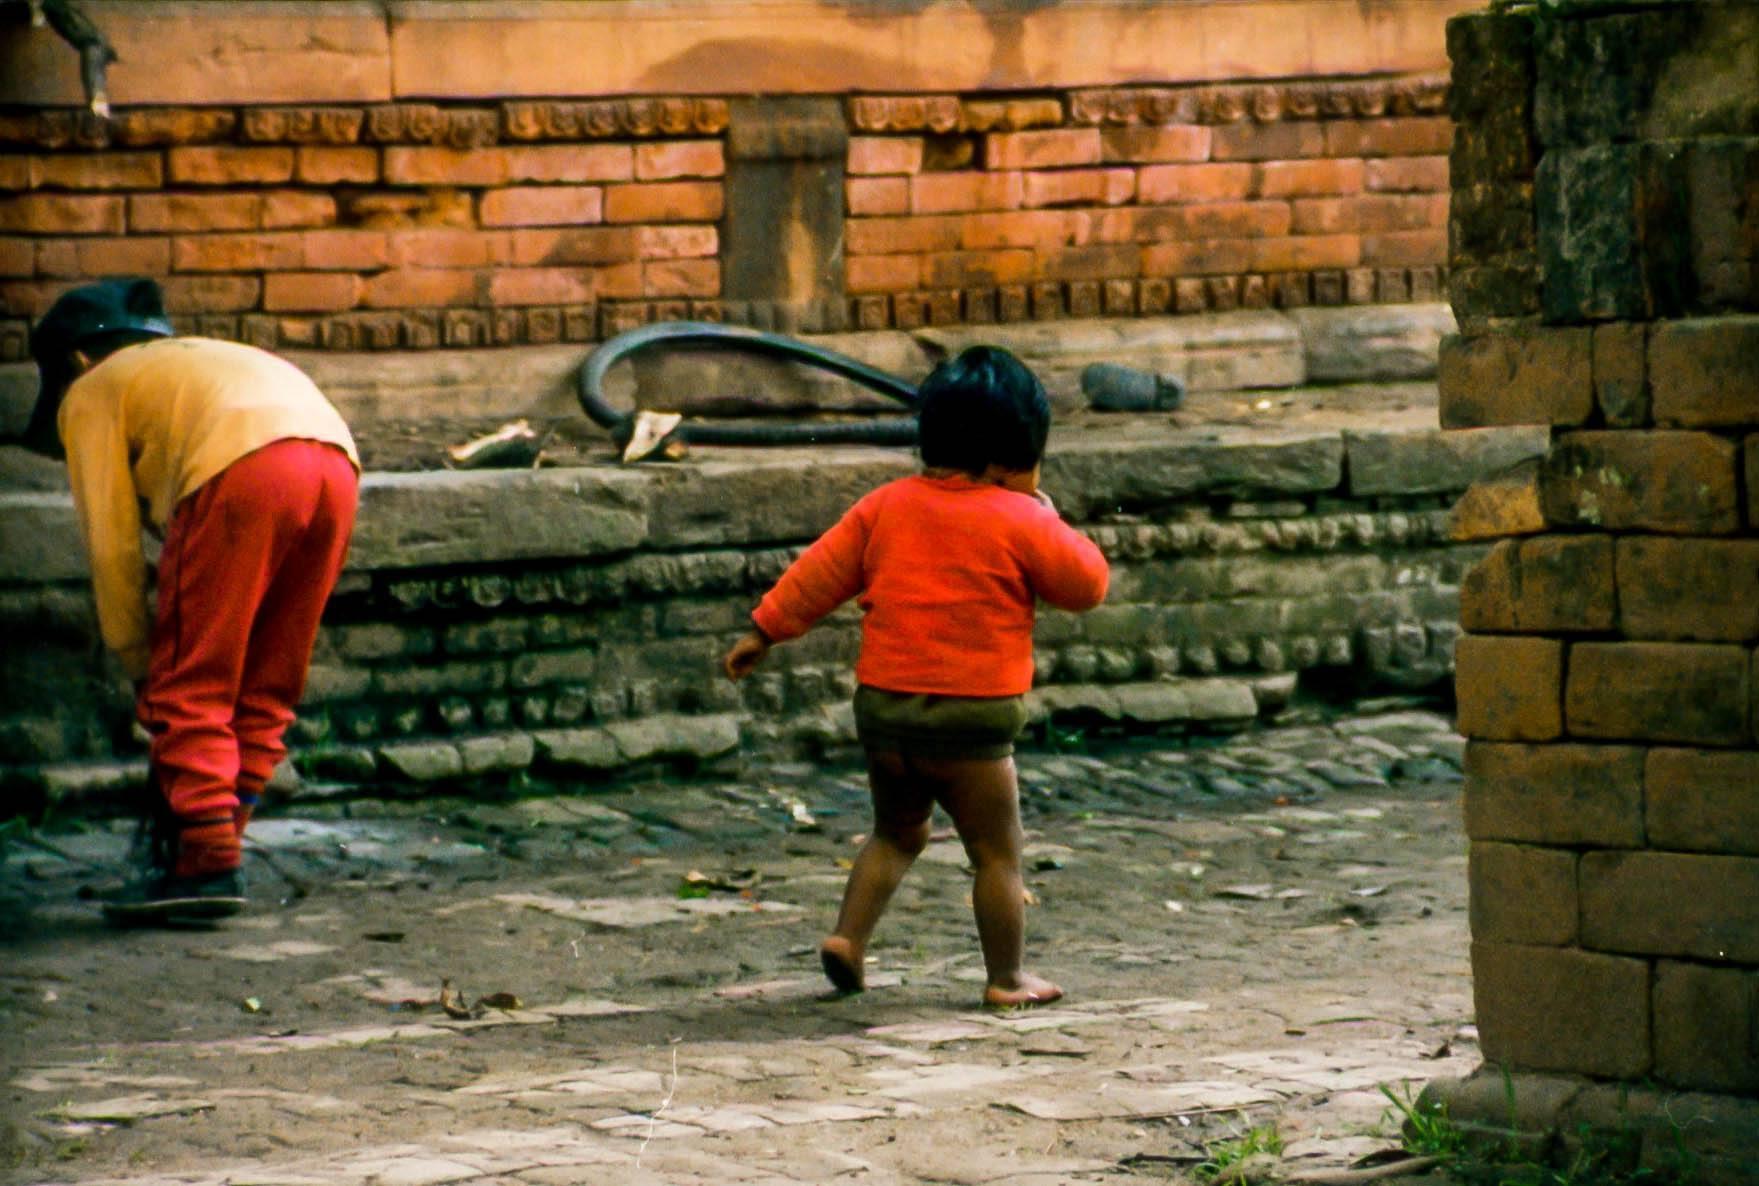 A child wandering the streets of Kathmandu